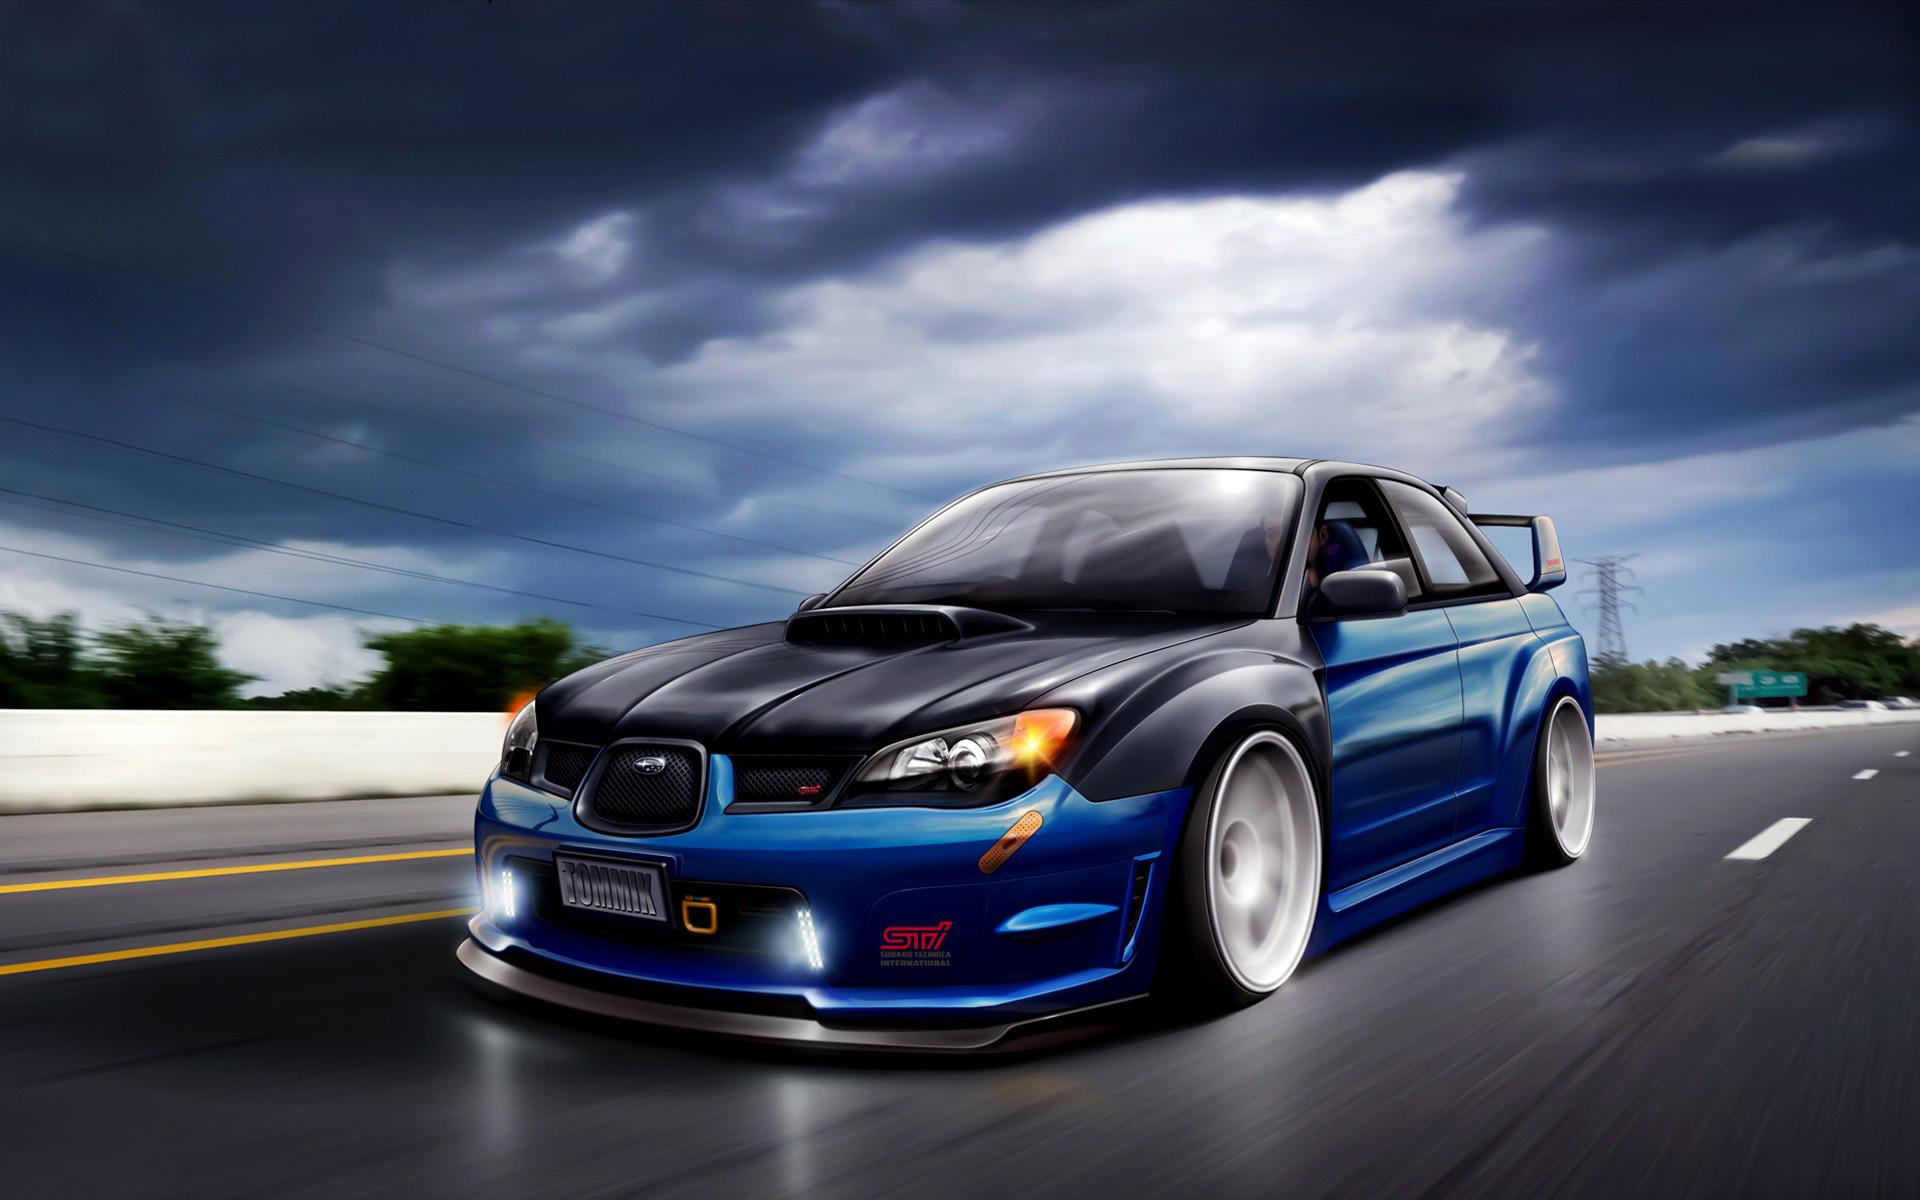 Subaru Impreza WRX STI Wallpaper Subaru Cars (83 Wallpapers) – HD Wallpapers